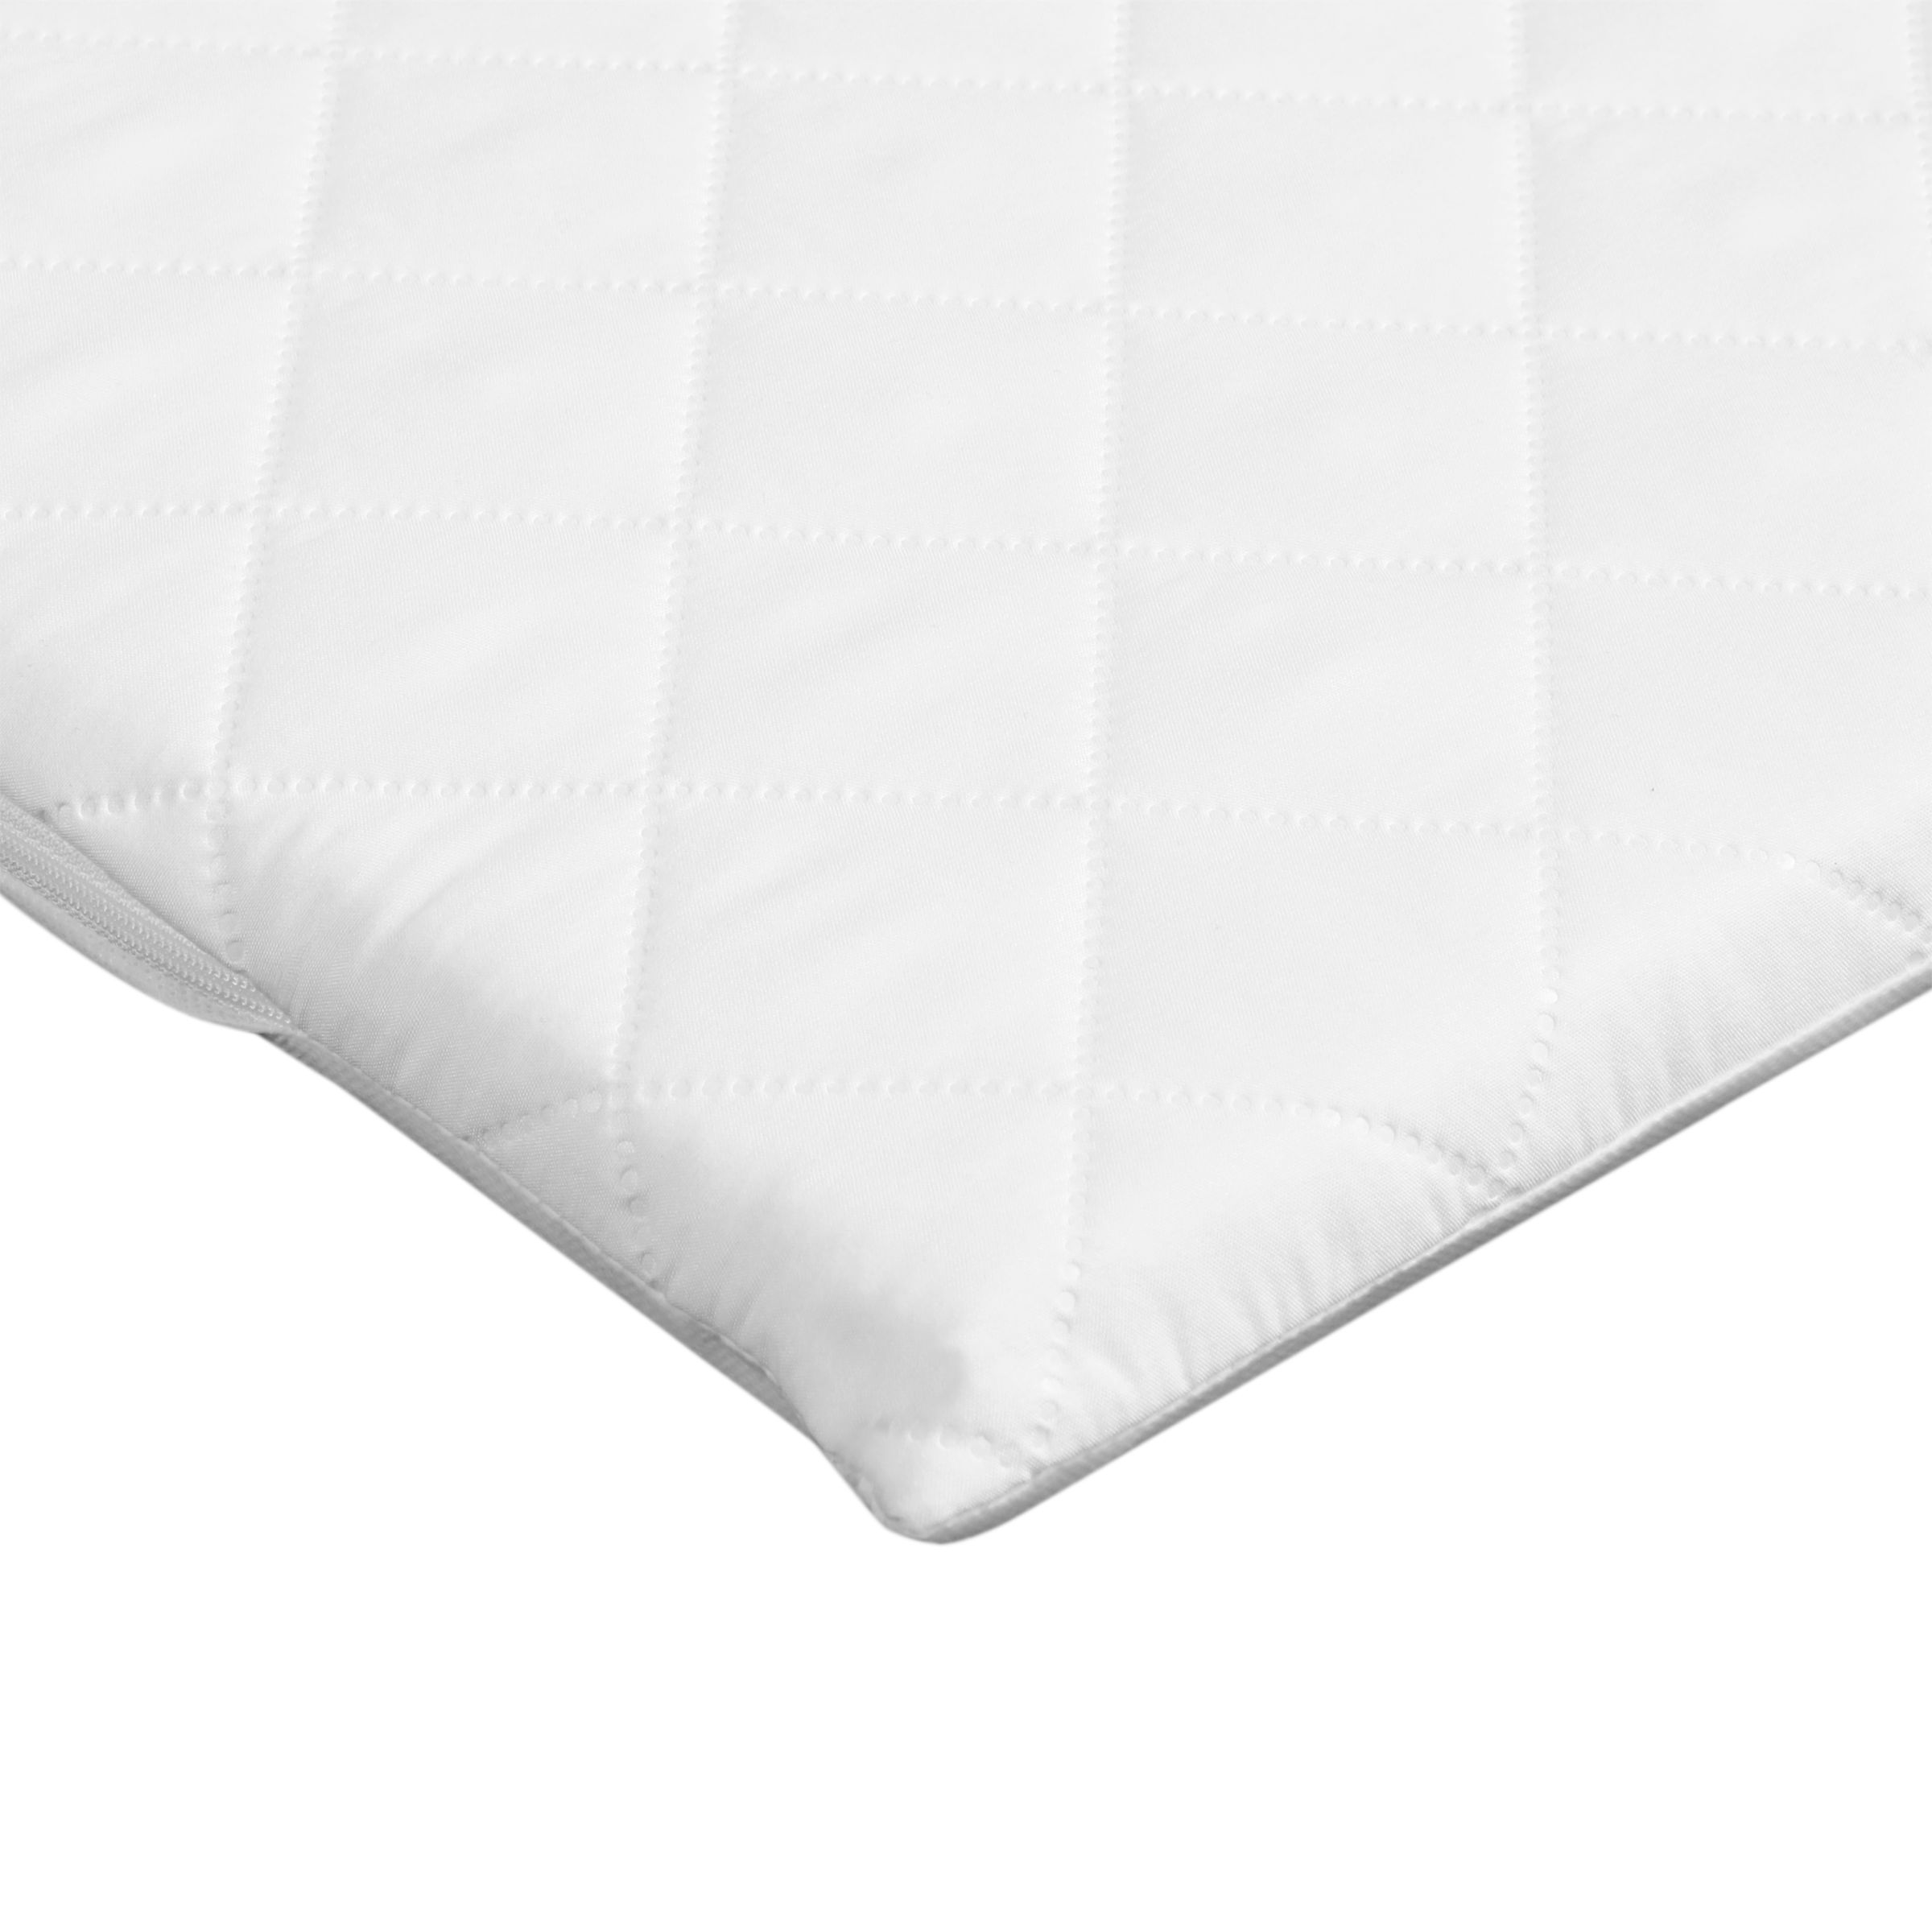 John Lewis & Partners Premium Foam Crib Mattress, 84 x 40cm